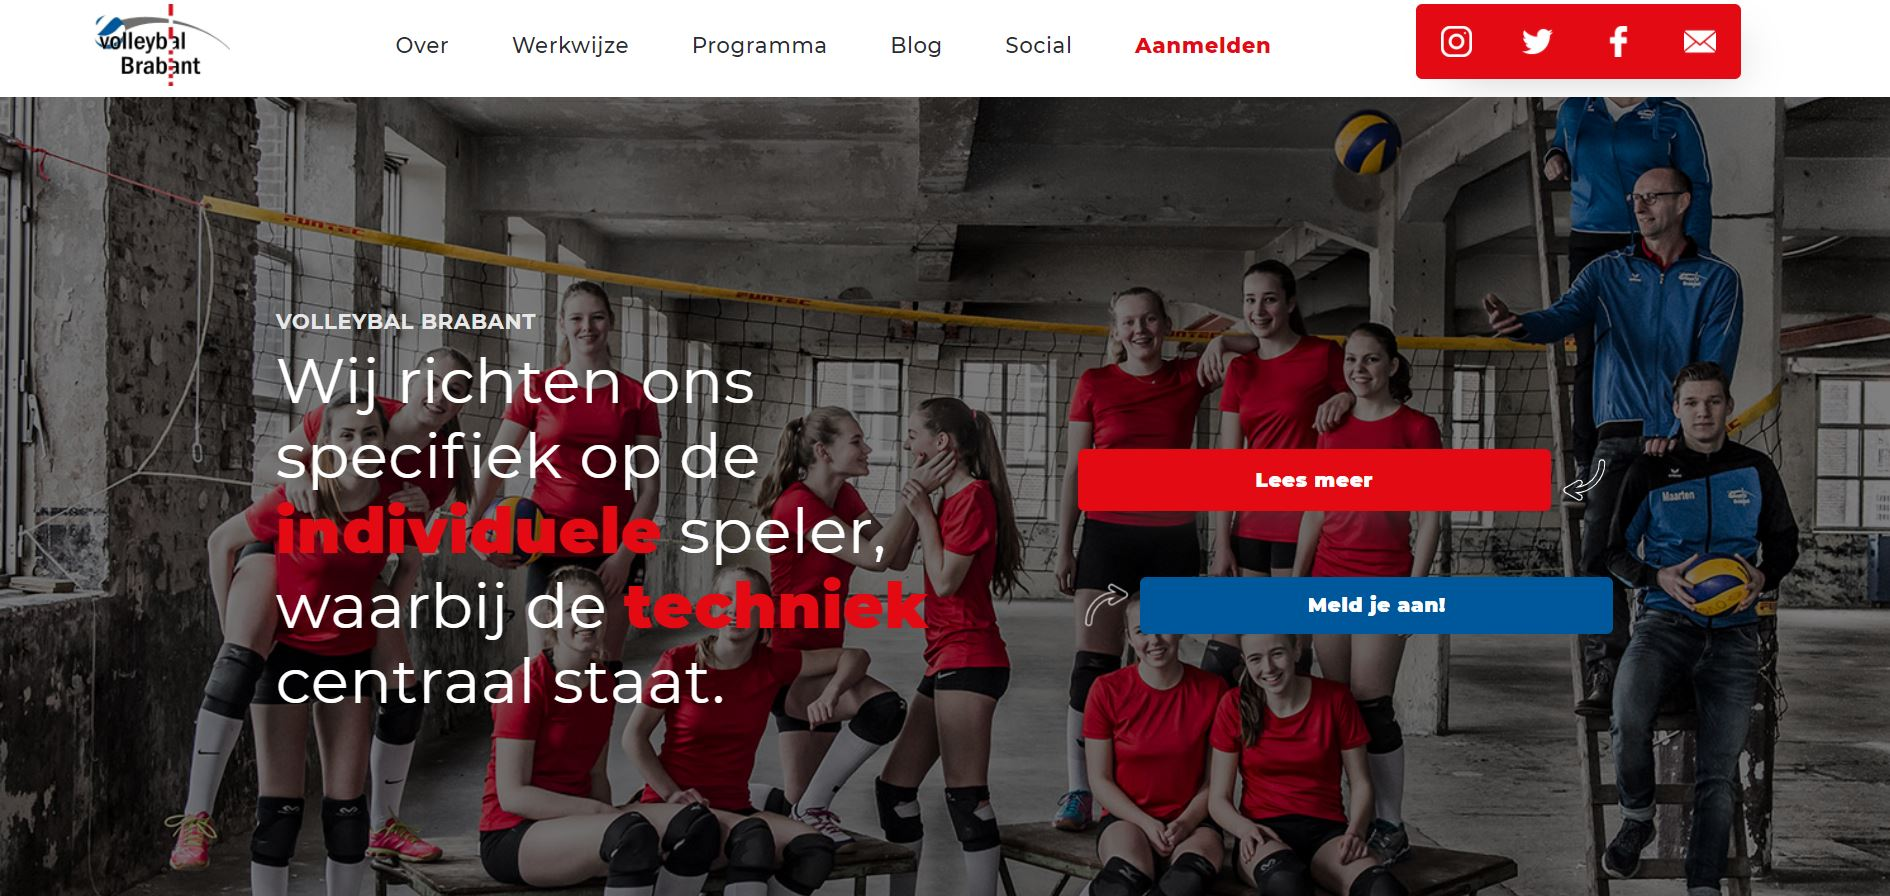 Volleybal Brabant